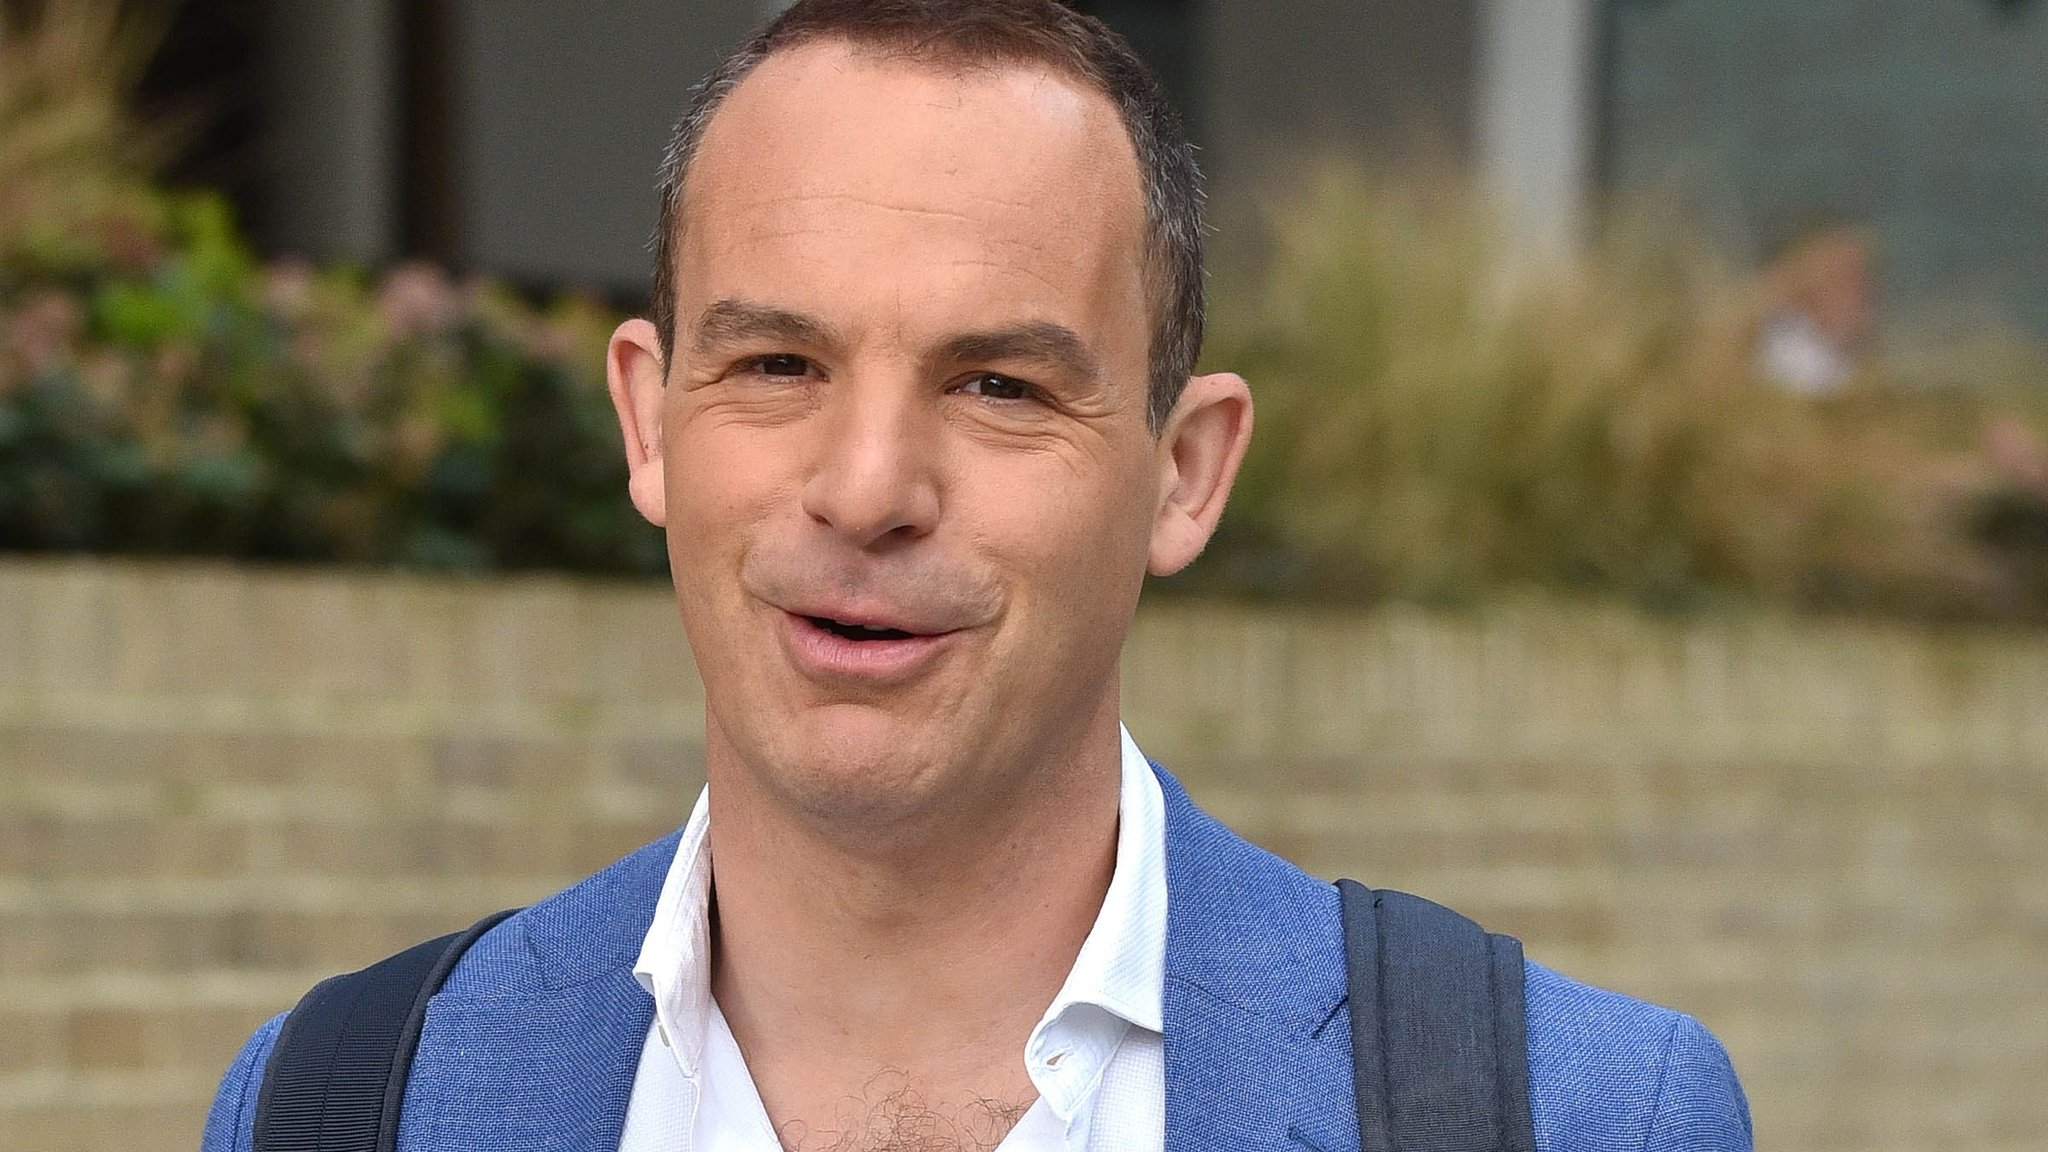 Martin Lewis drops Facebook legal action